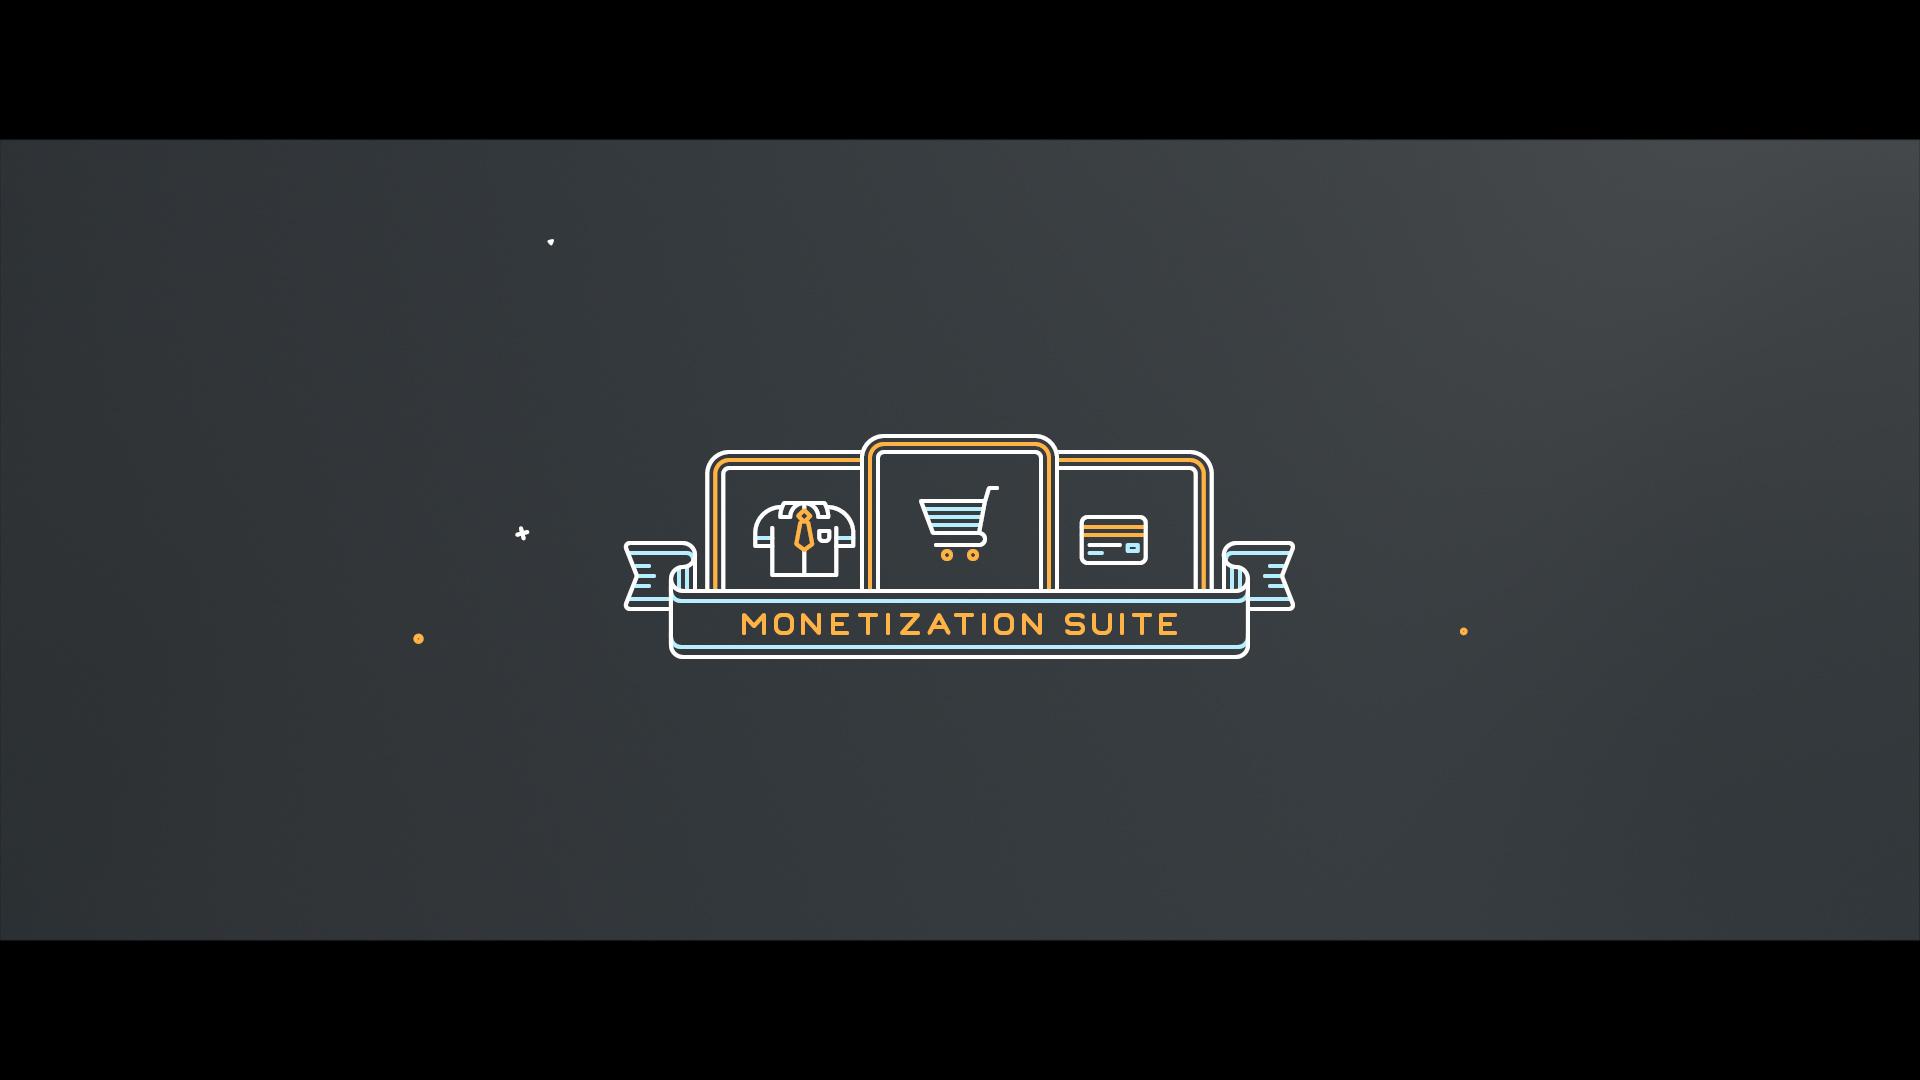 Monetization Video Center Image